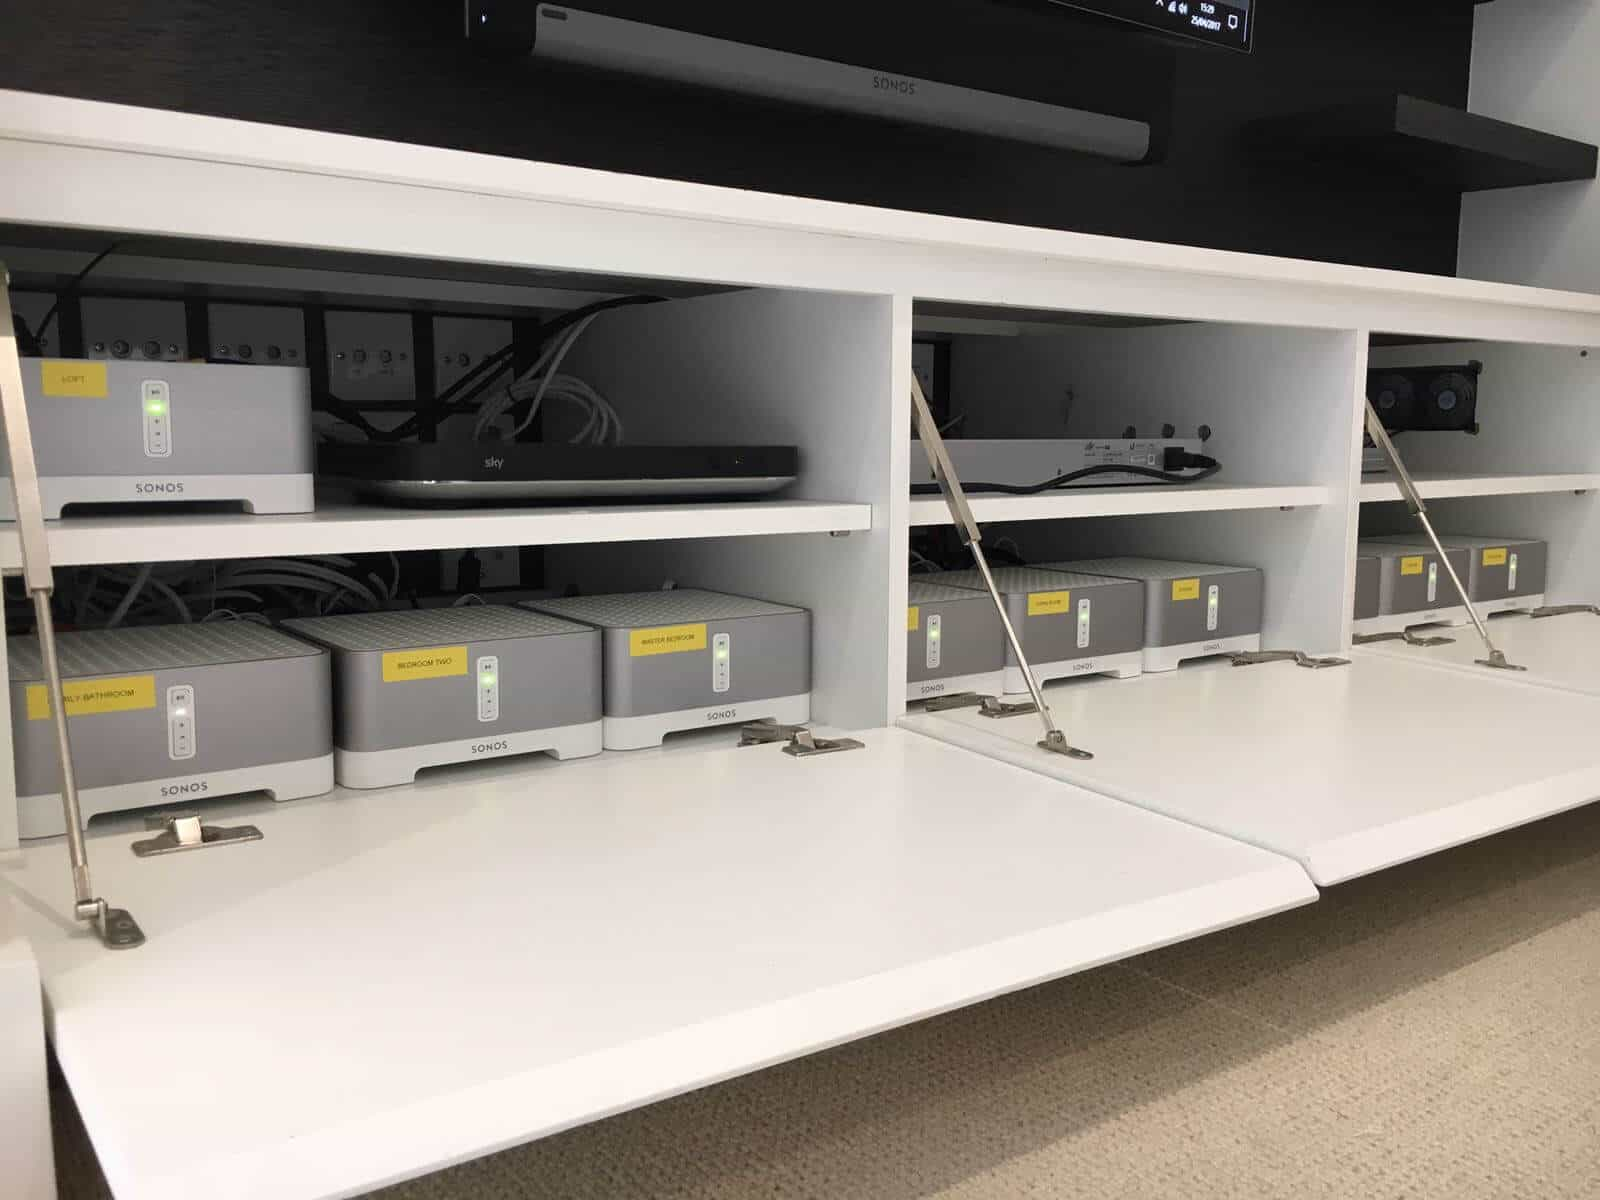 Multi-Room Audio Putney Sonos Connect Amplifiers